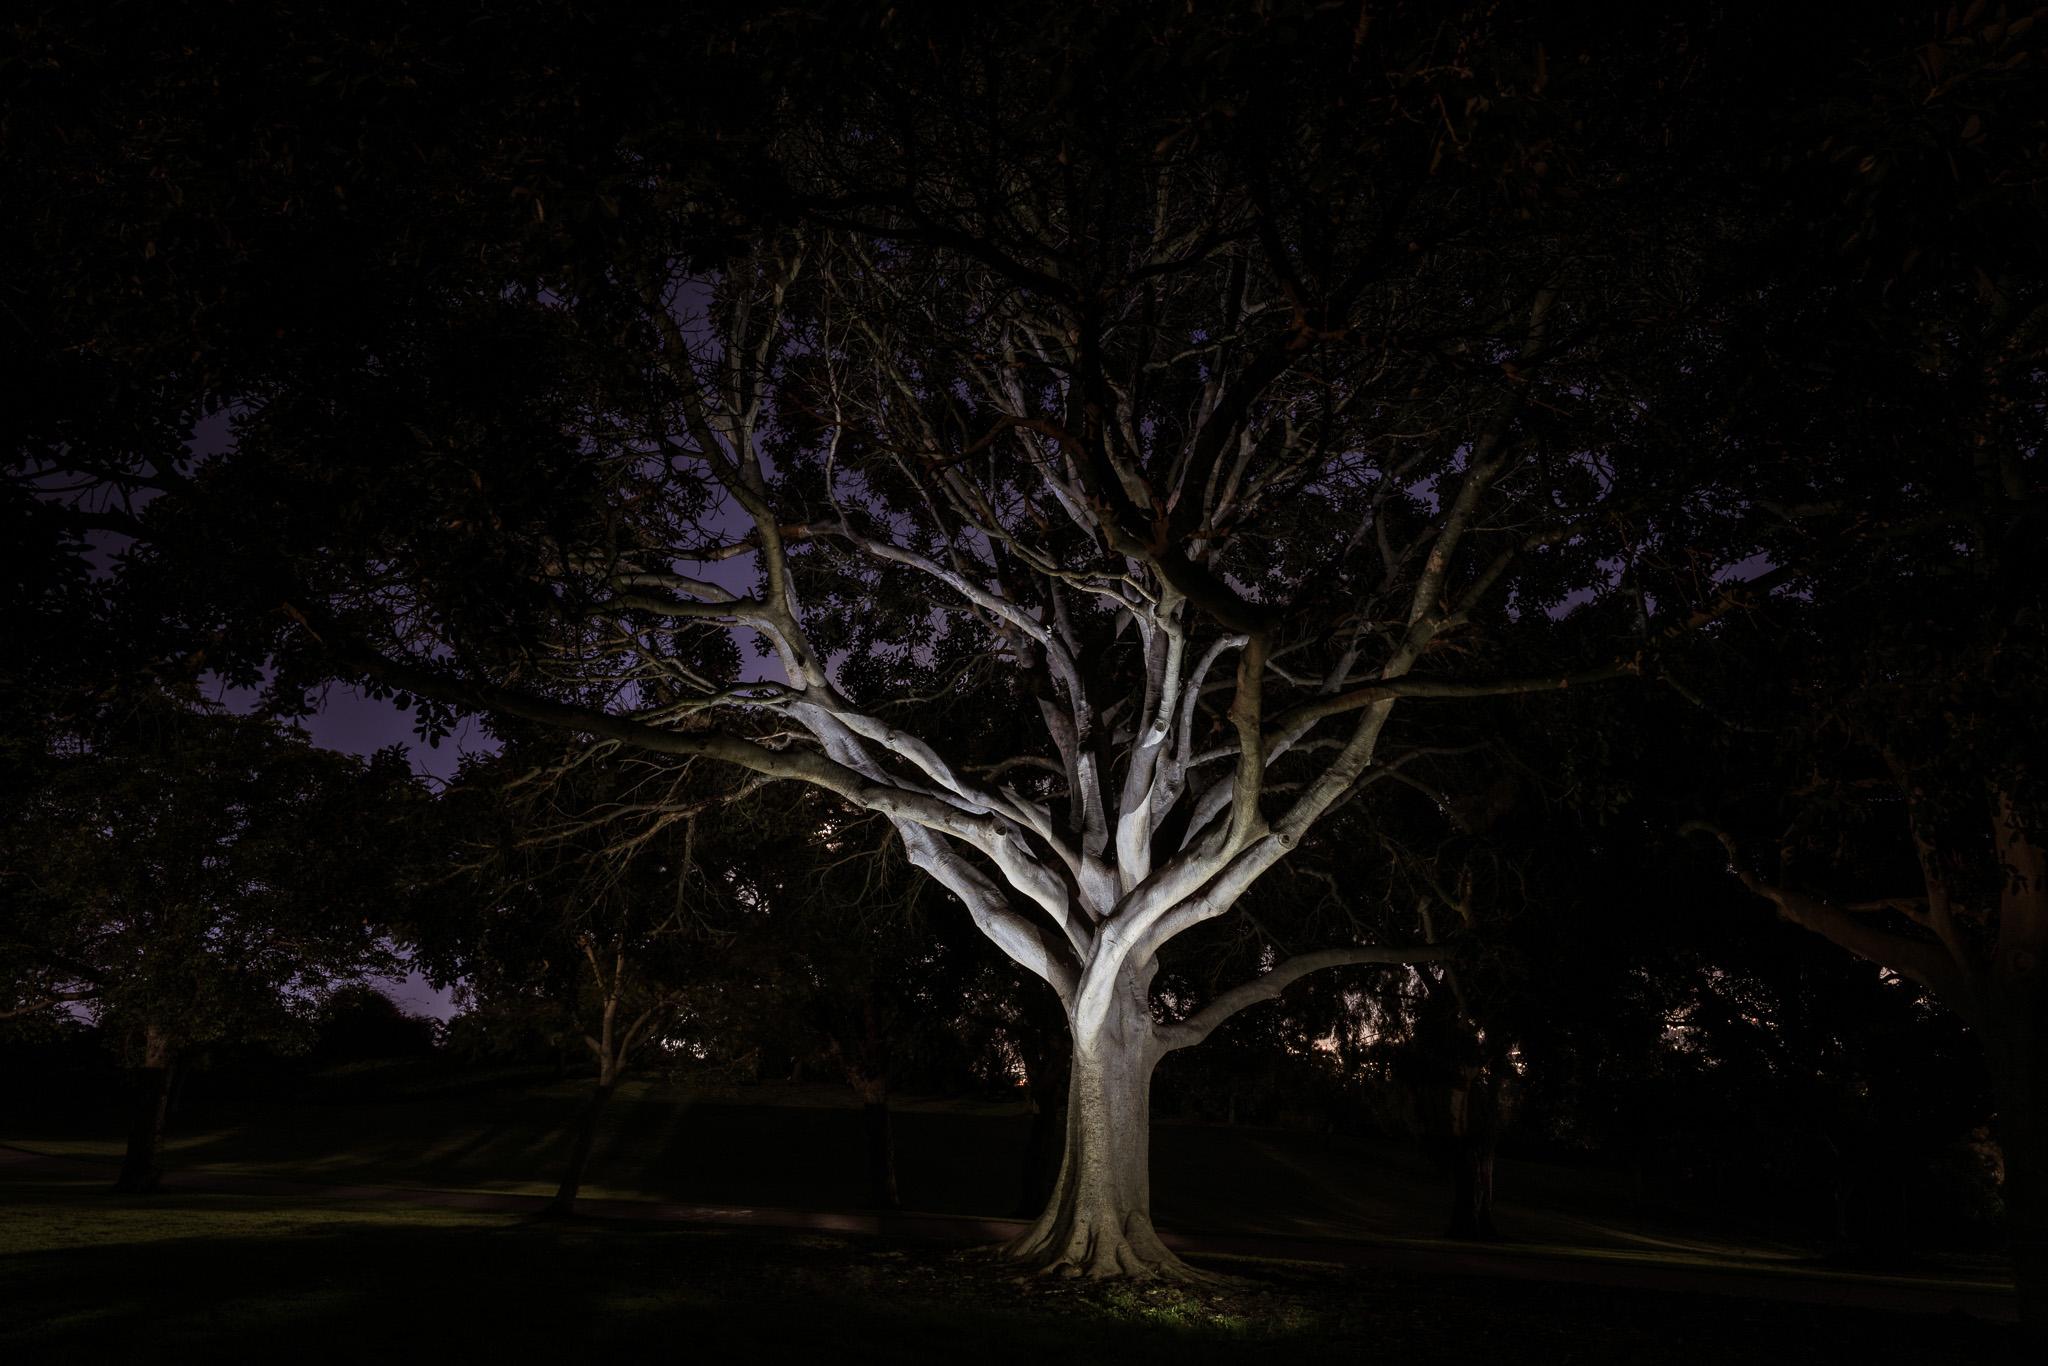 Tree, Kate Sessions Park